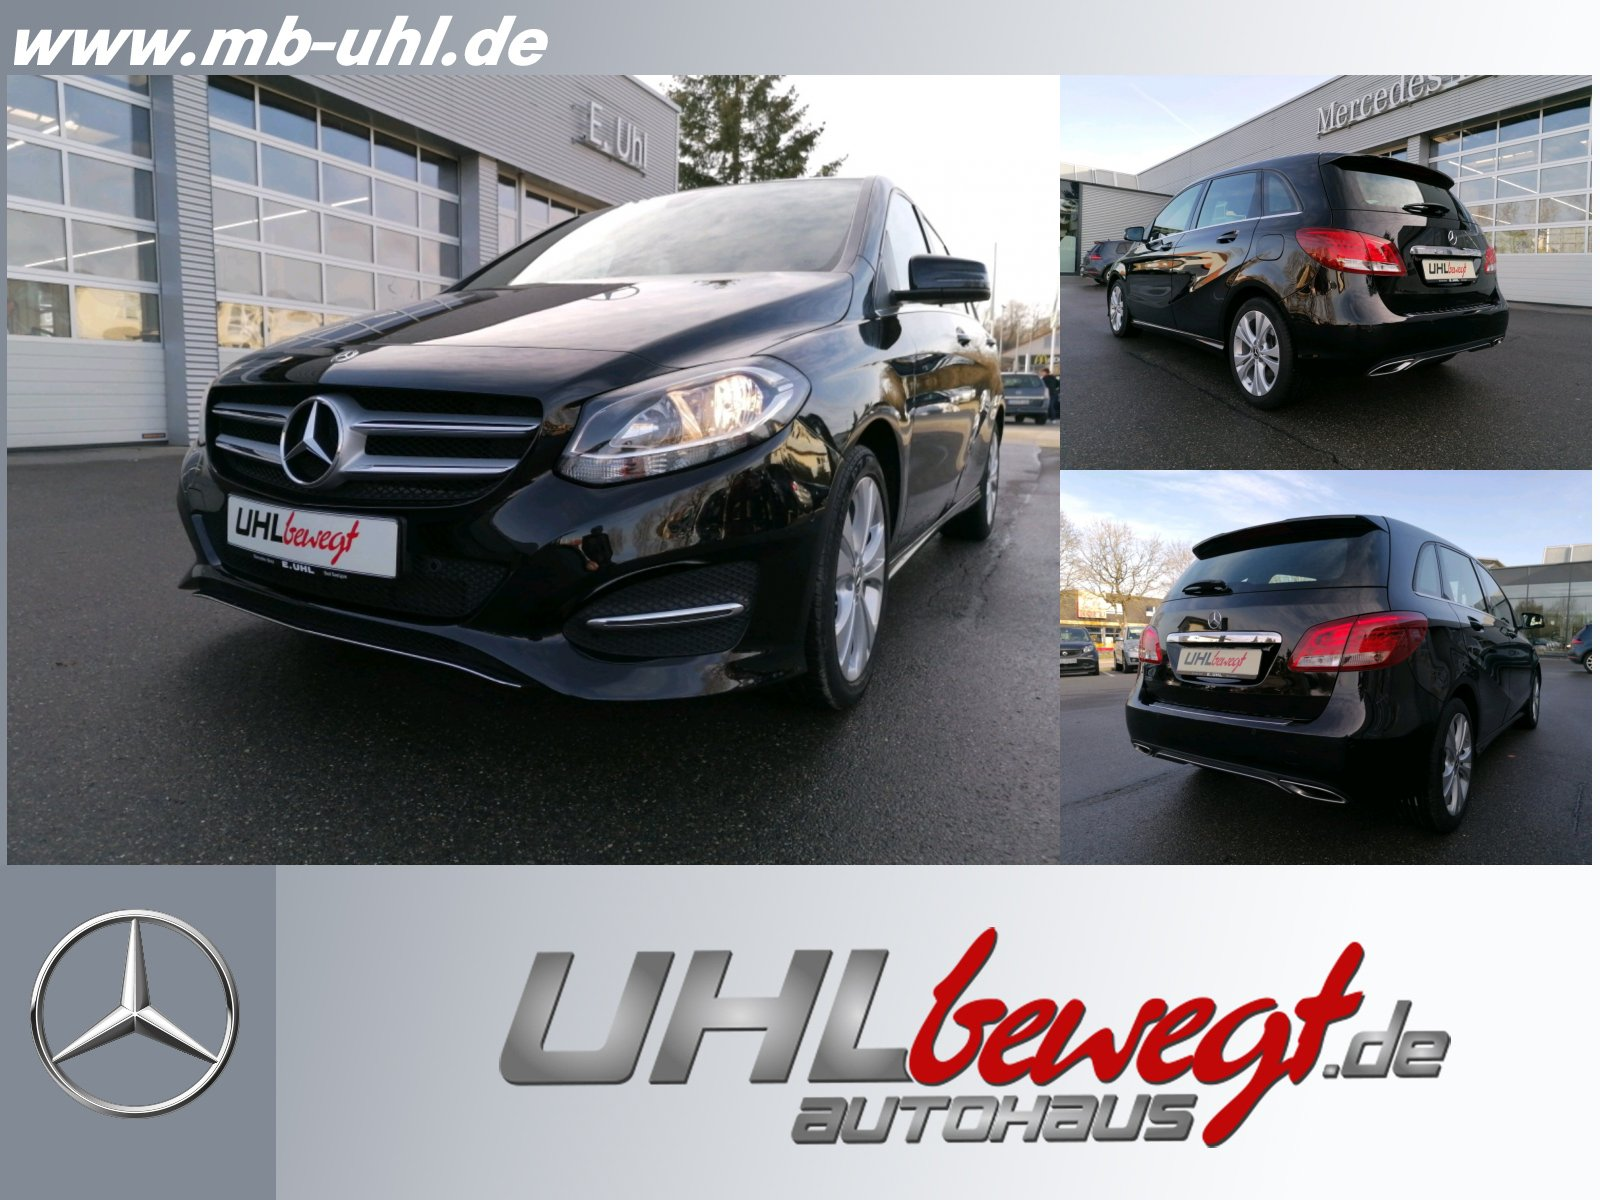 Mercedes-Benz B 220 d Urban/Navi/Kamera/Autom./AHK/Klima/Telefon, Jahr 2017, Diesel